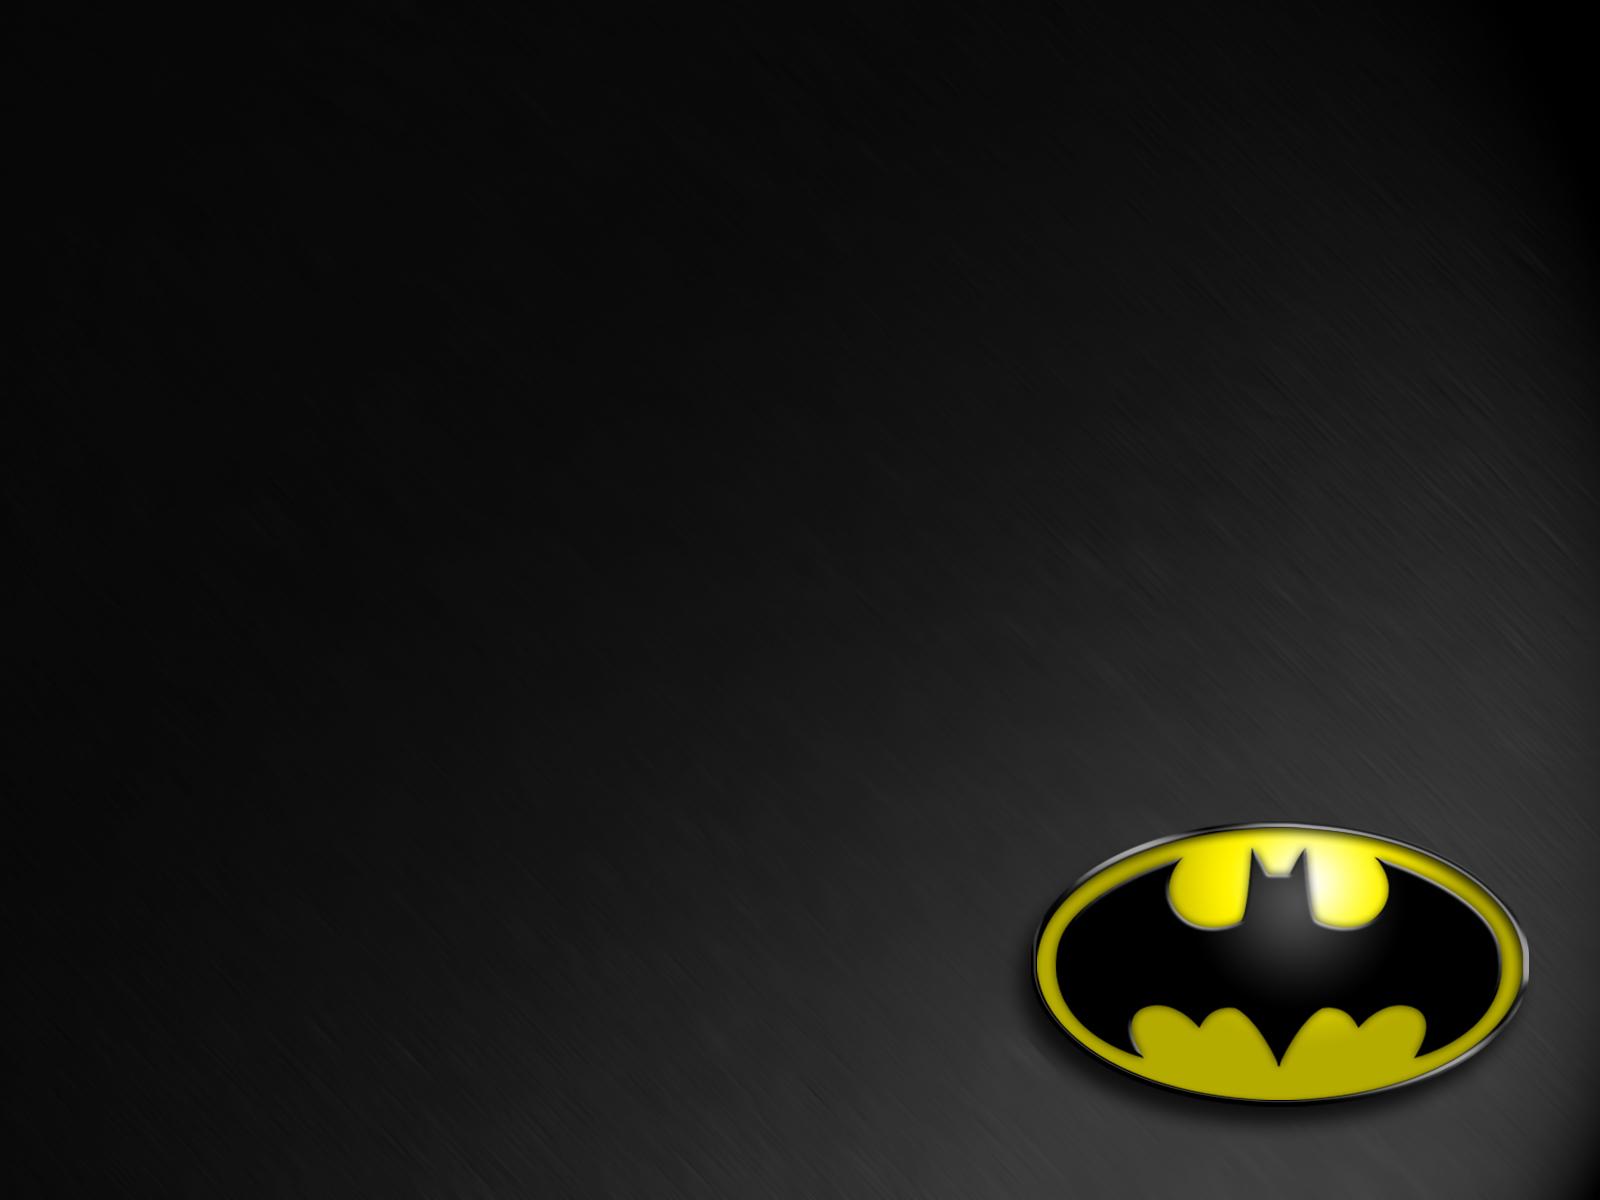 Batman Computer Wallpapers Desktop Backgrounds 1600x1200 ID 1600x1200